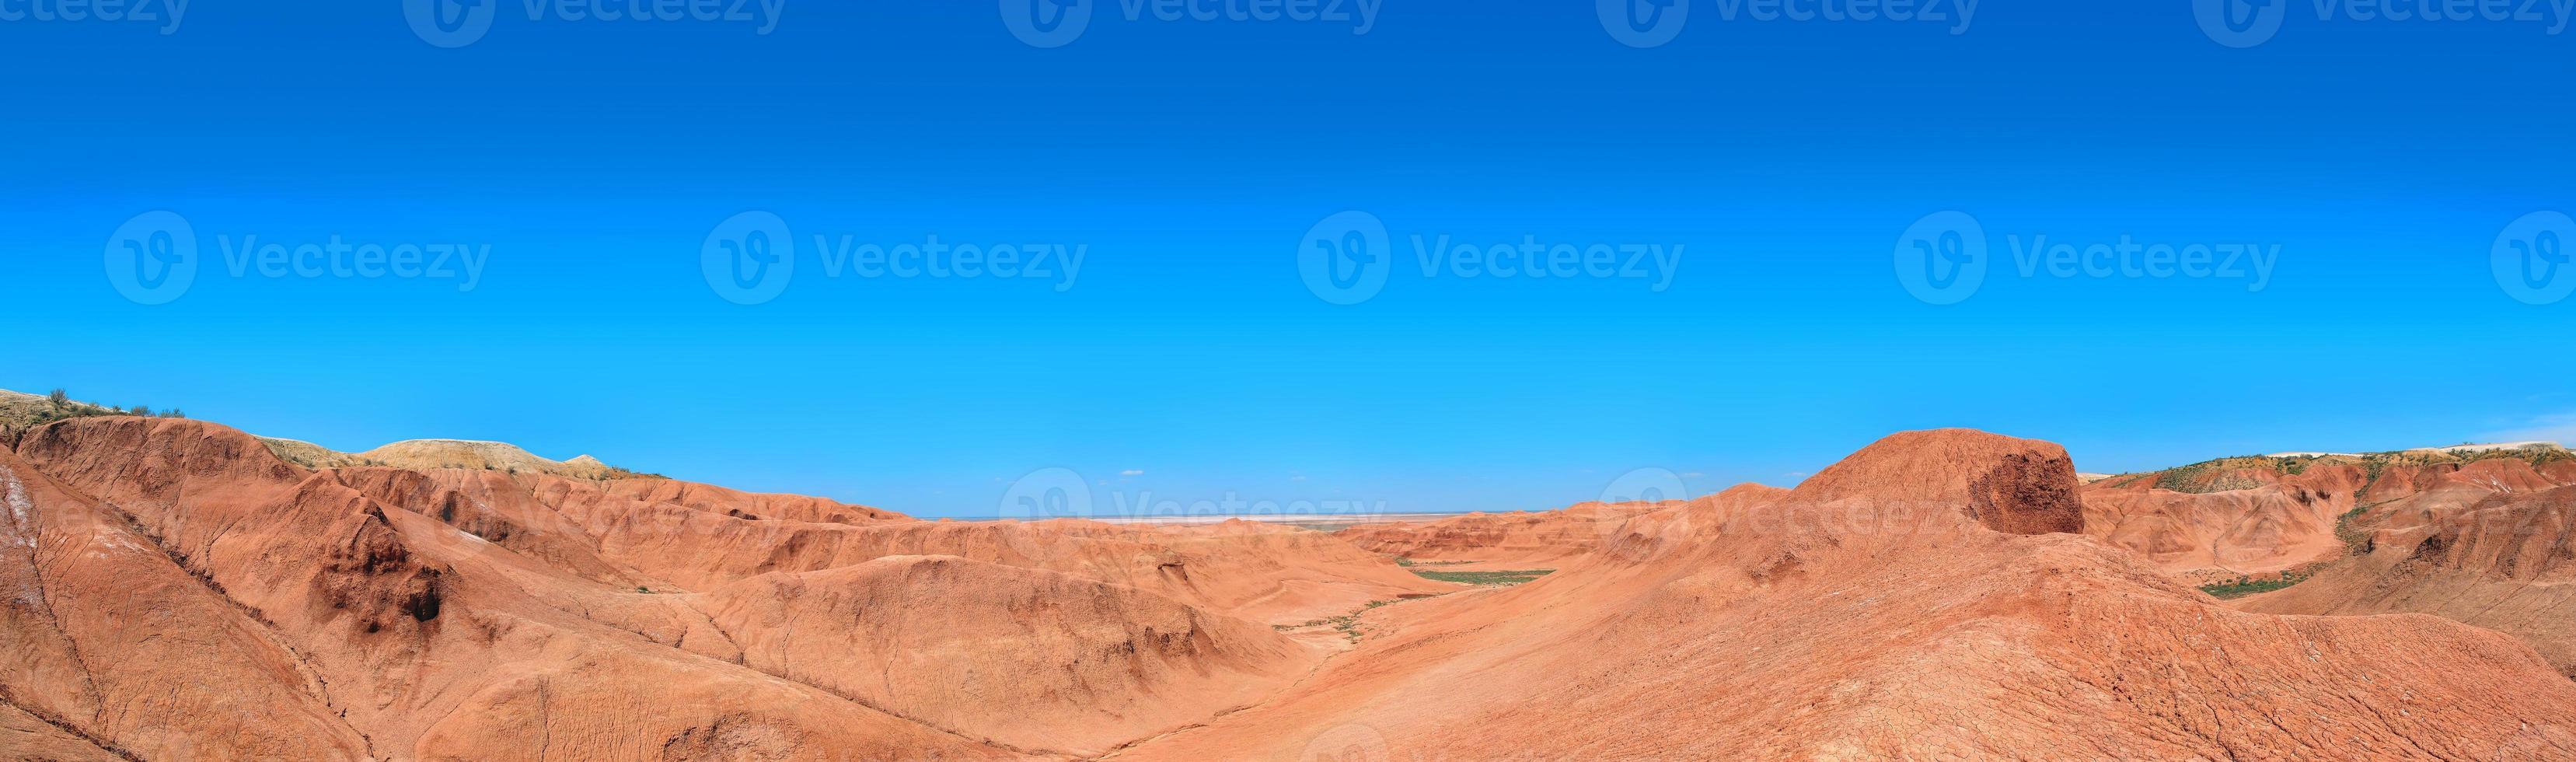 argillaceous öken foto